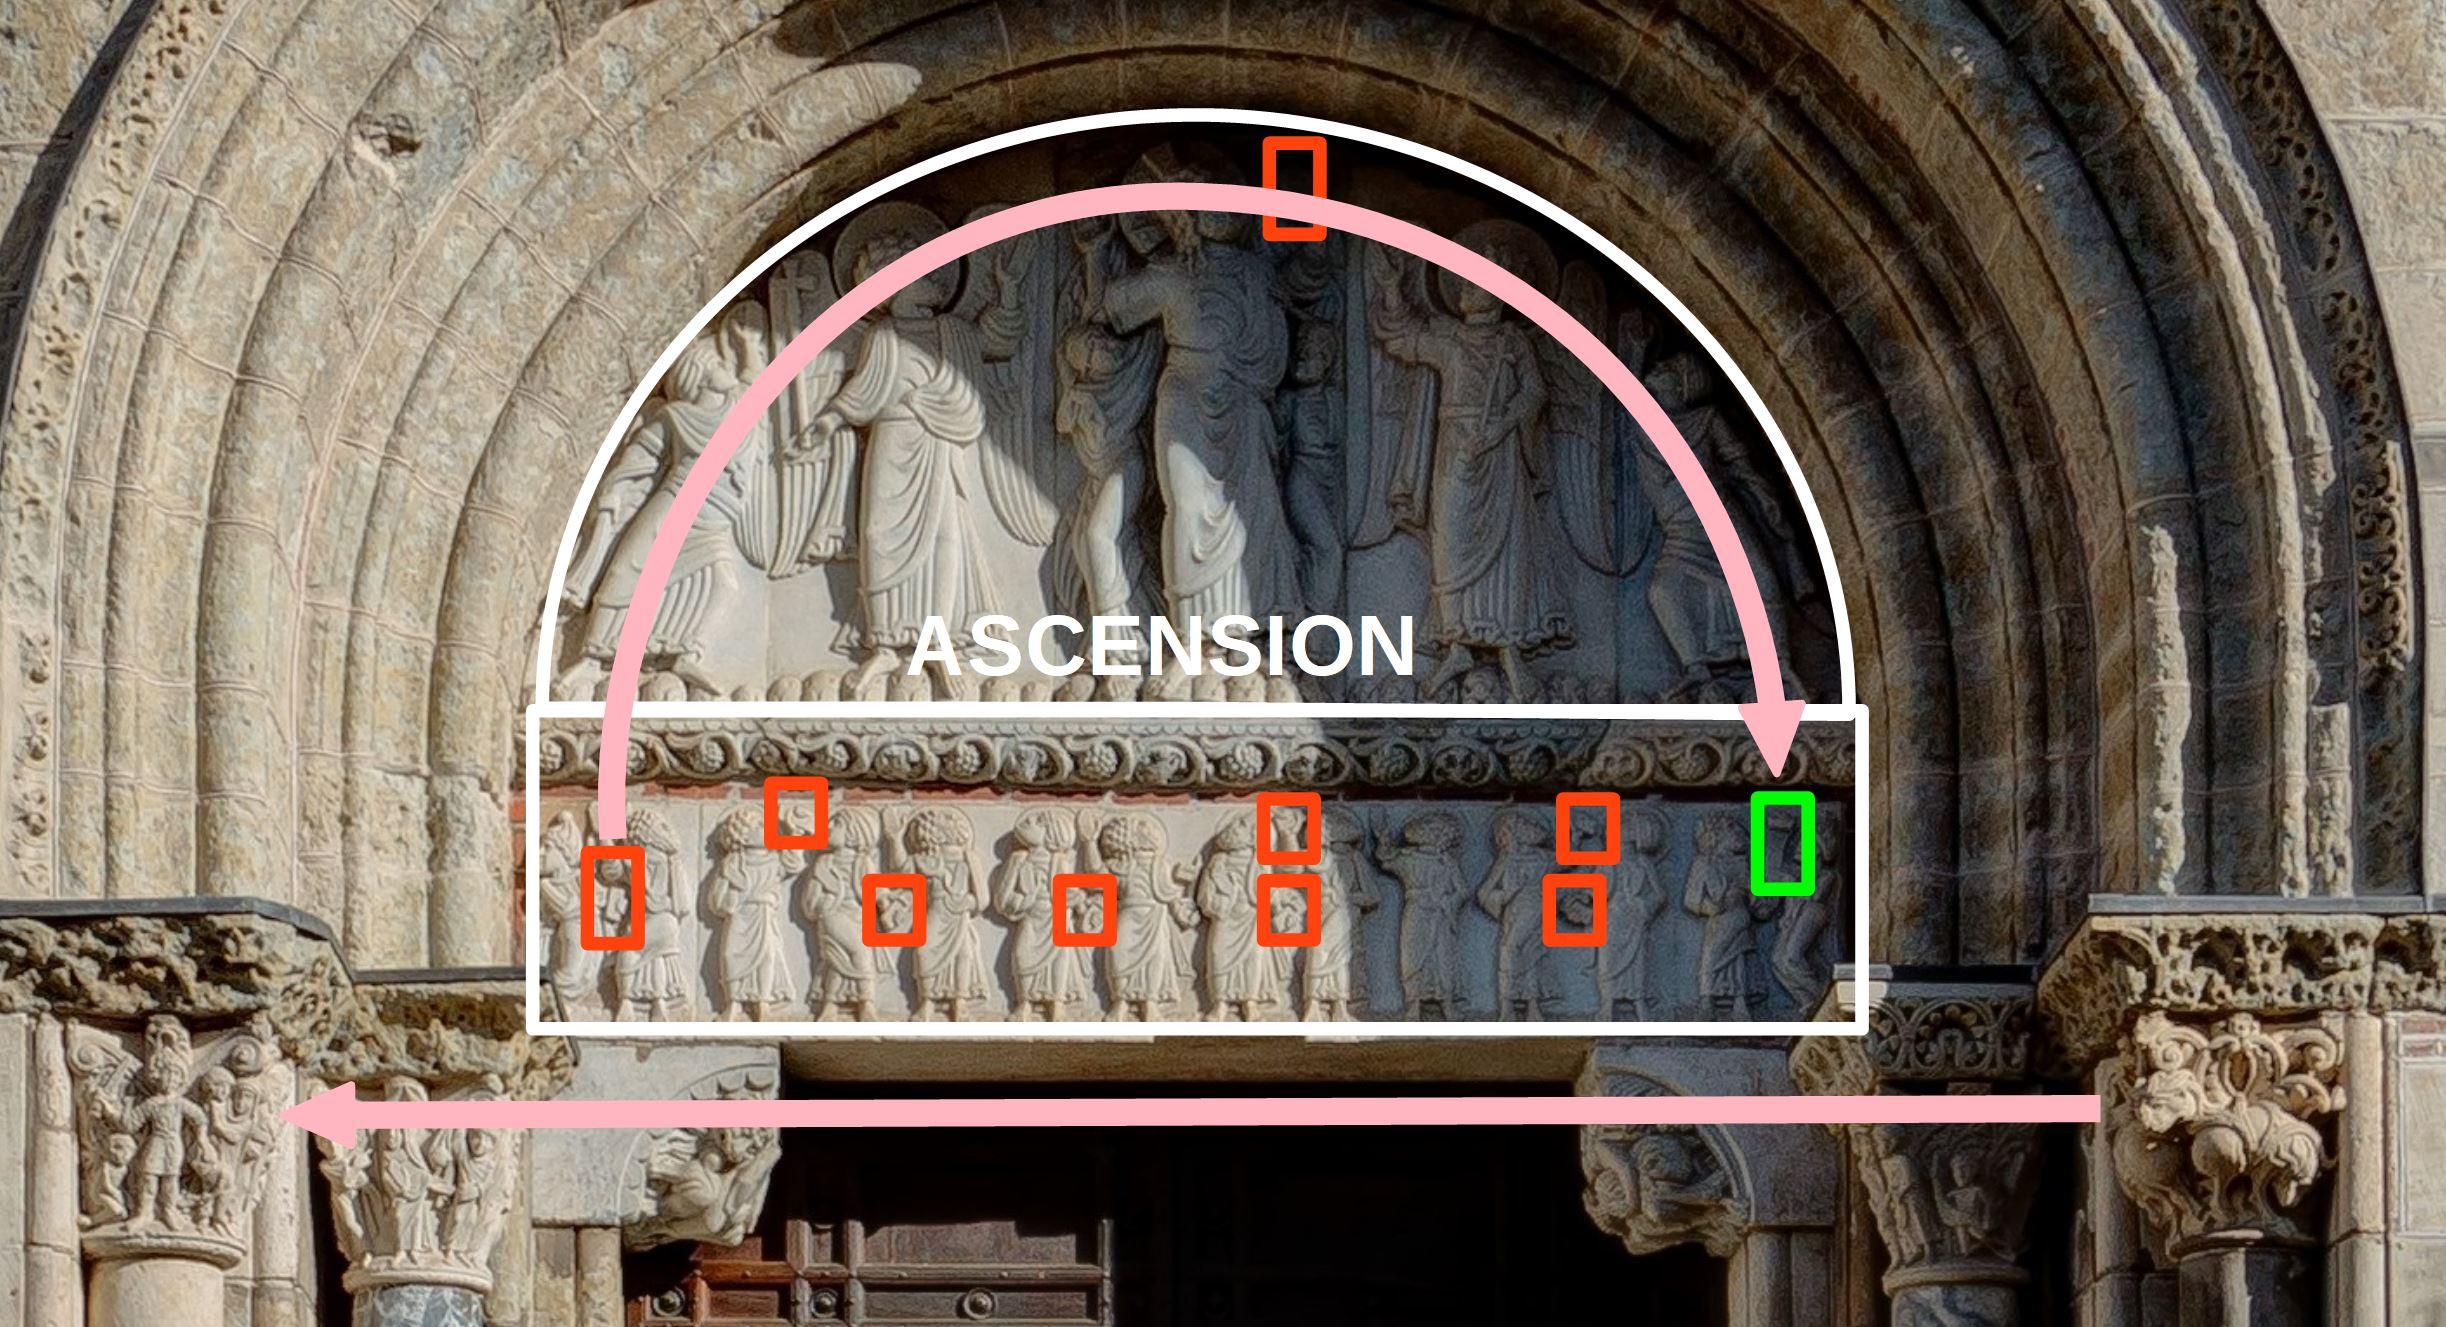 Porte_Miegeville_-_Basilique_Saint-Sernin schema 2